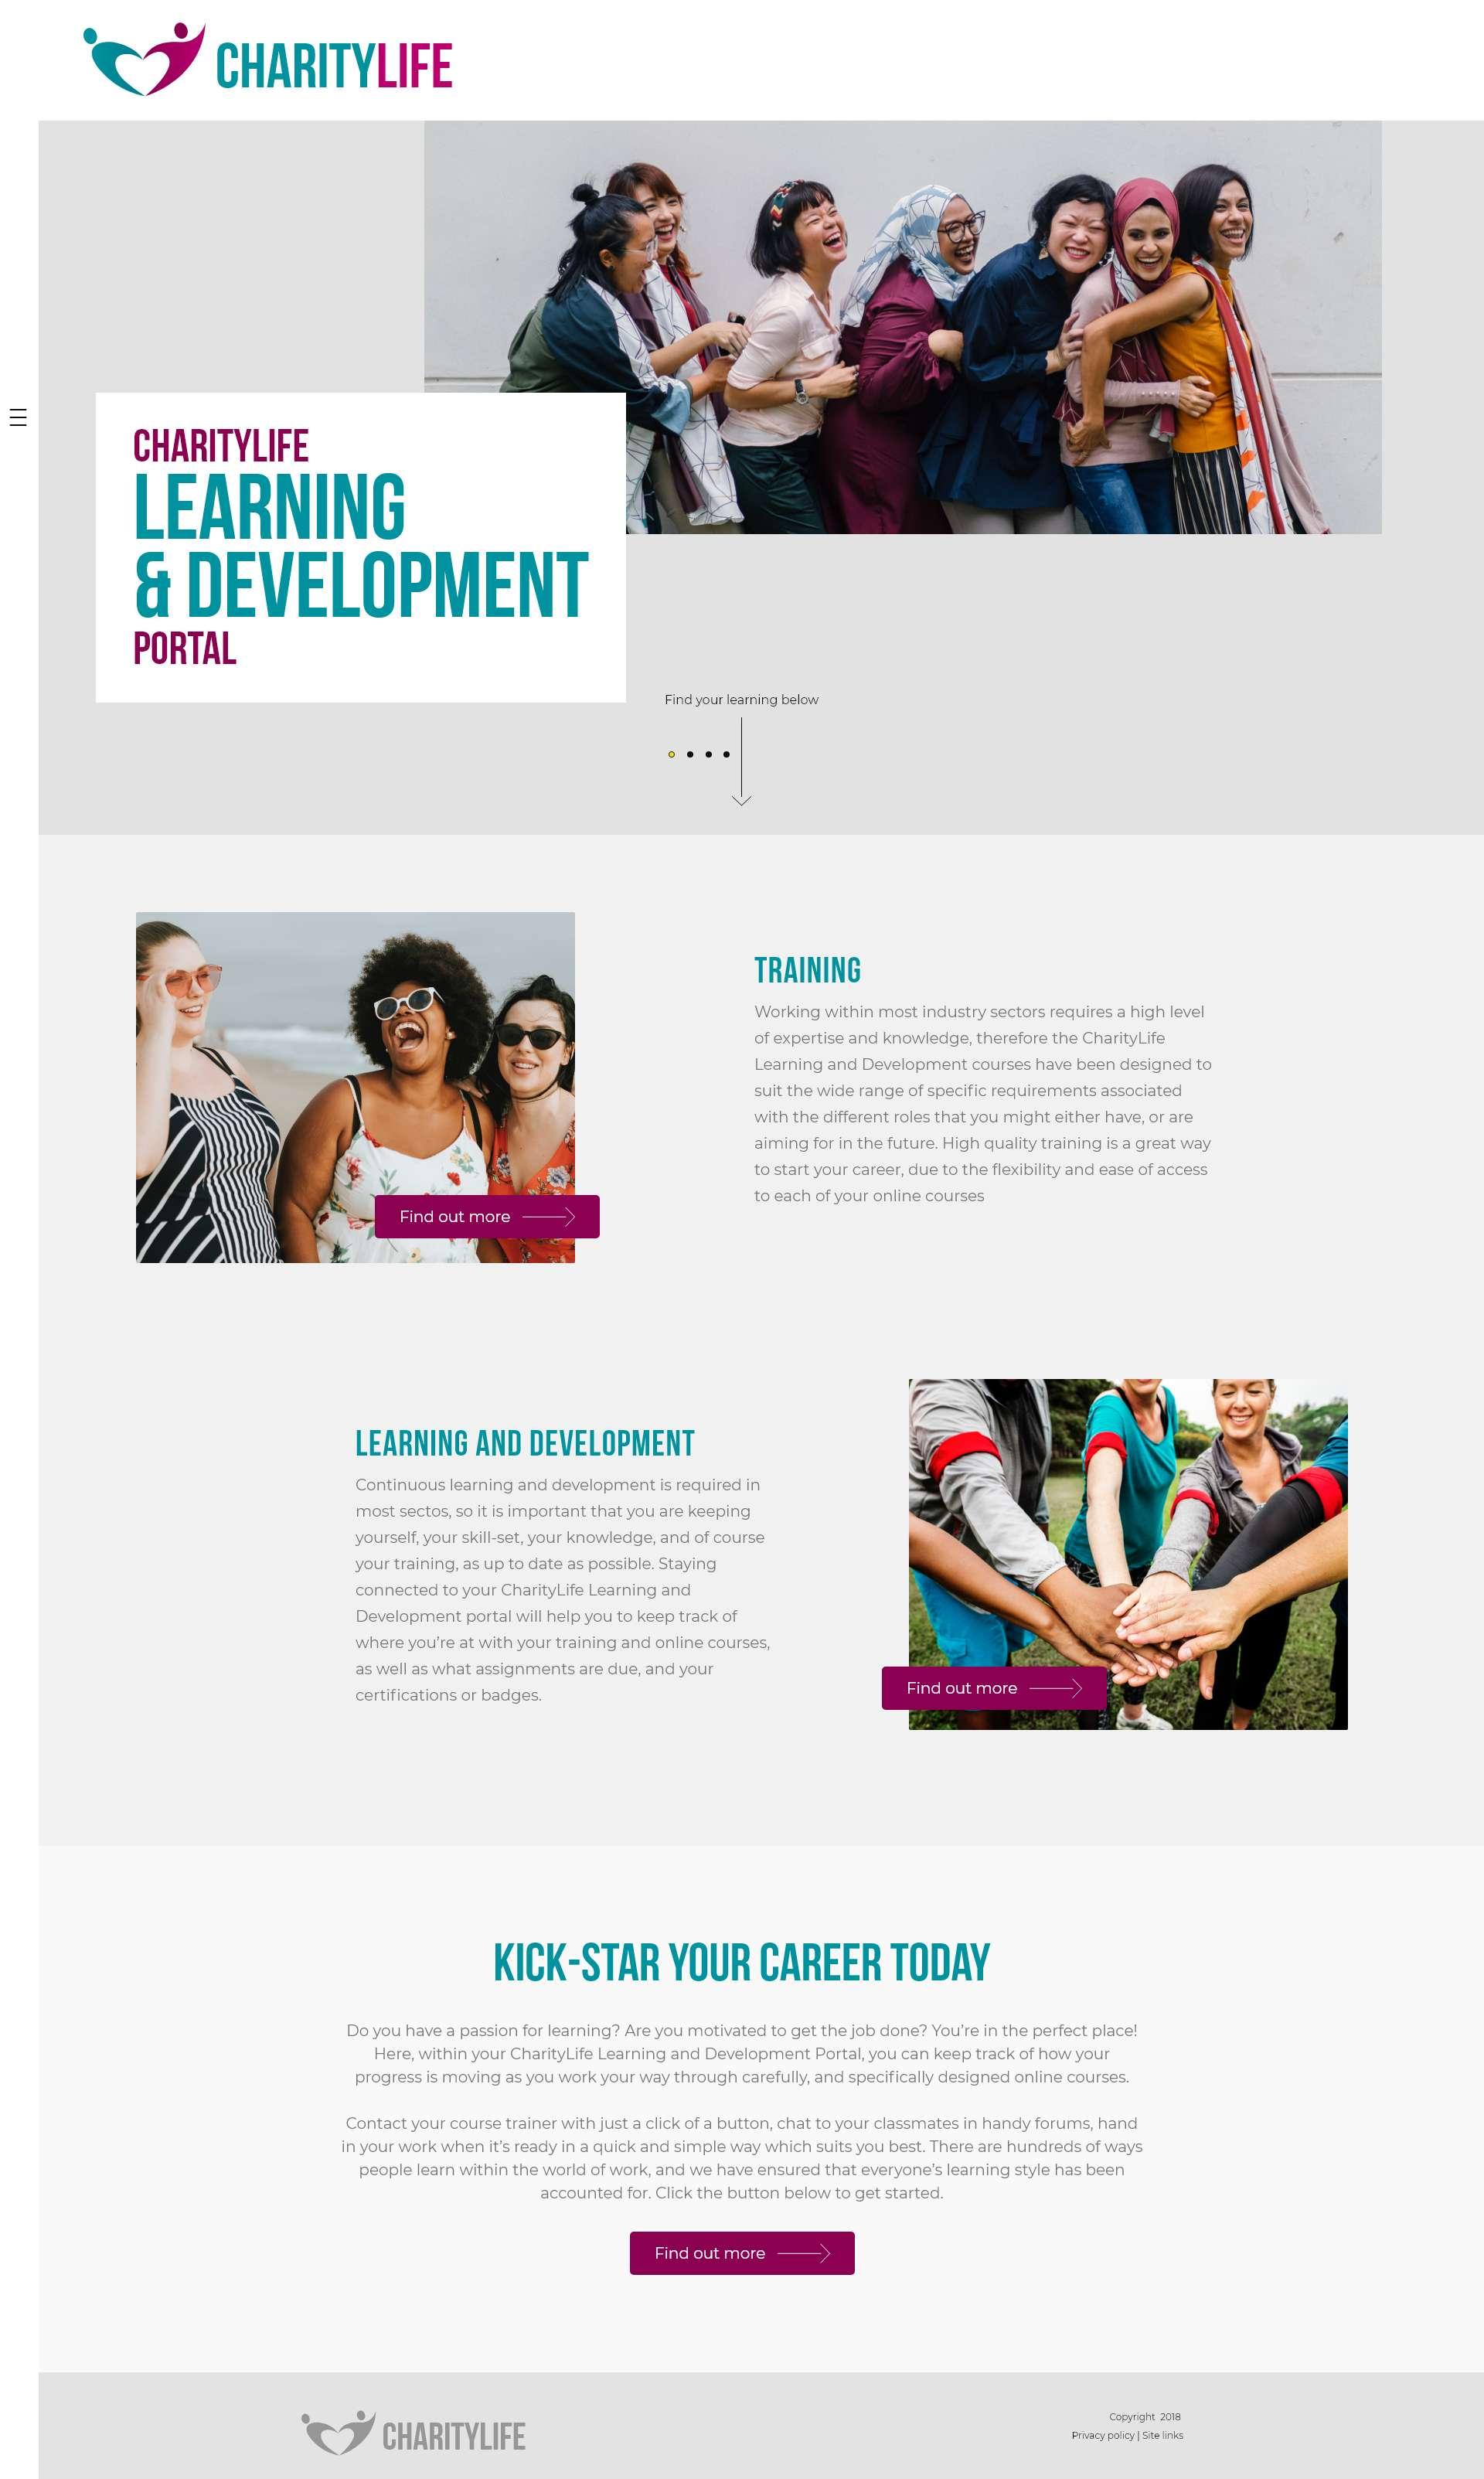 Design It - Charity Life - Desktop